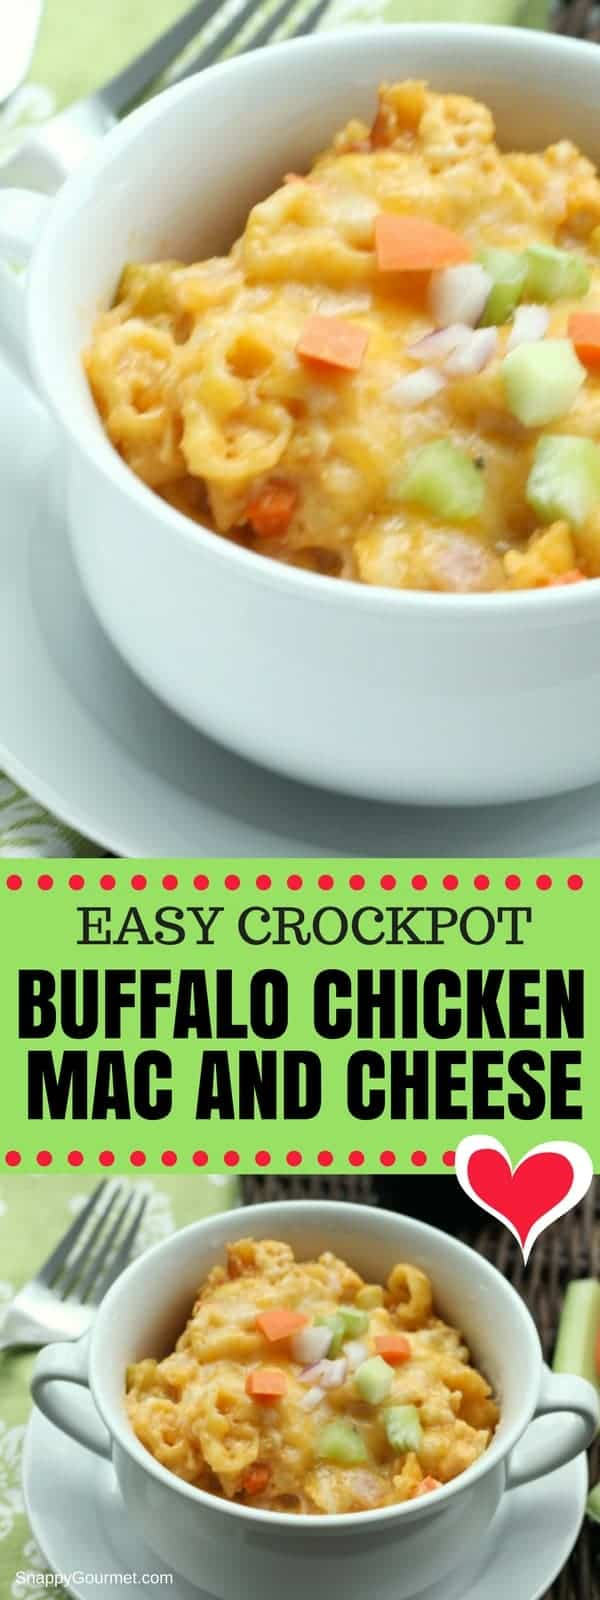 Buffalo Chicken Mac and Cheese (Crockpot) Recipe - easy slow cooker buffalo chicken macaroni and cheese full of chicken, pasta, cheese, and veggies!